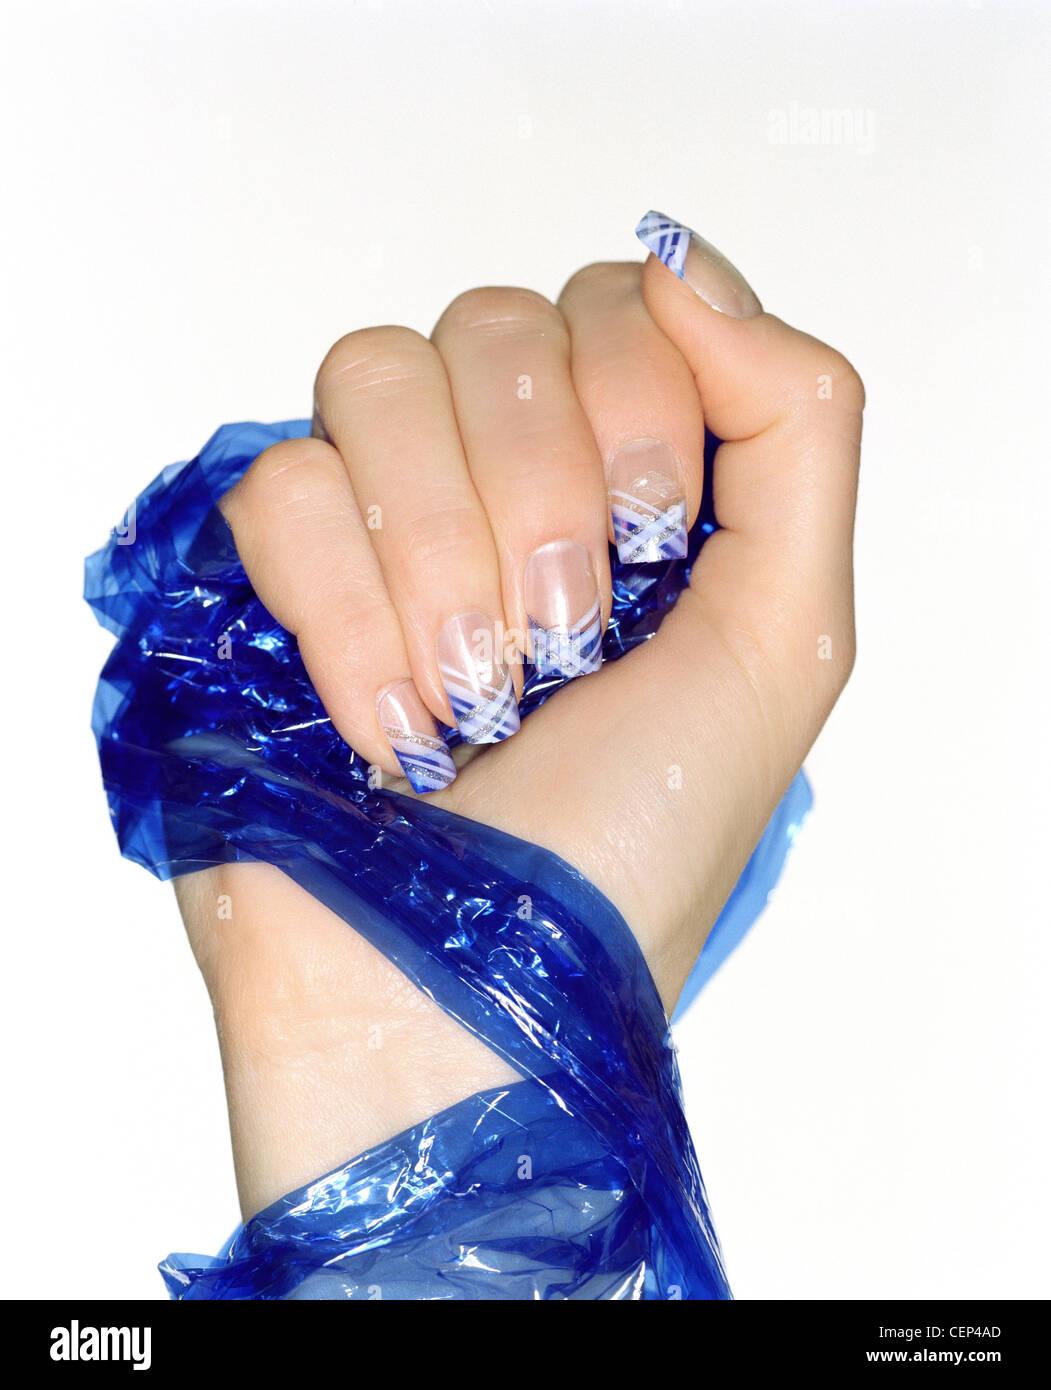 Hand Nail Cross Stockfotos & Hand Nail Cross Bilder - Alamy